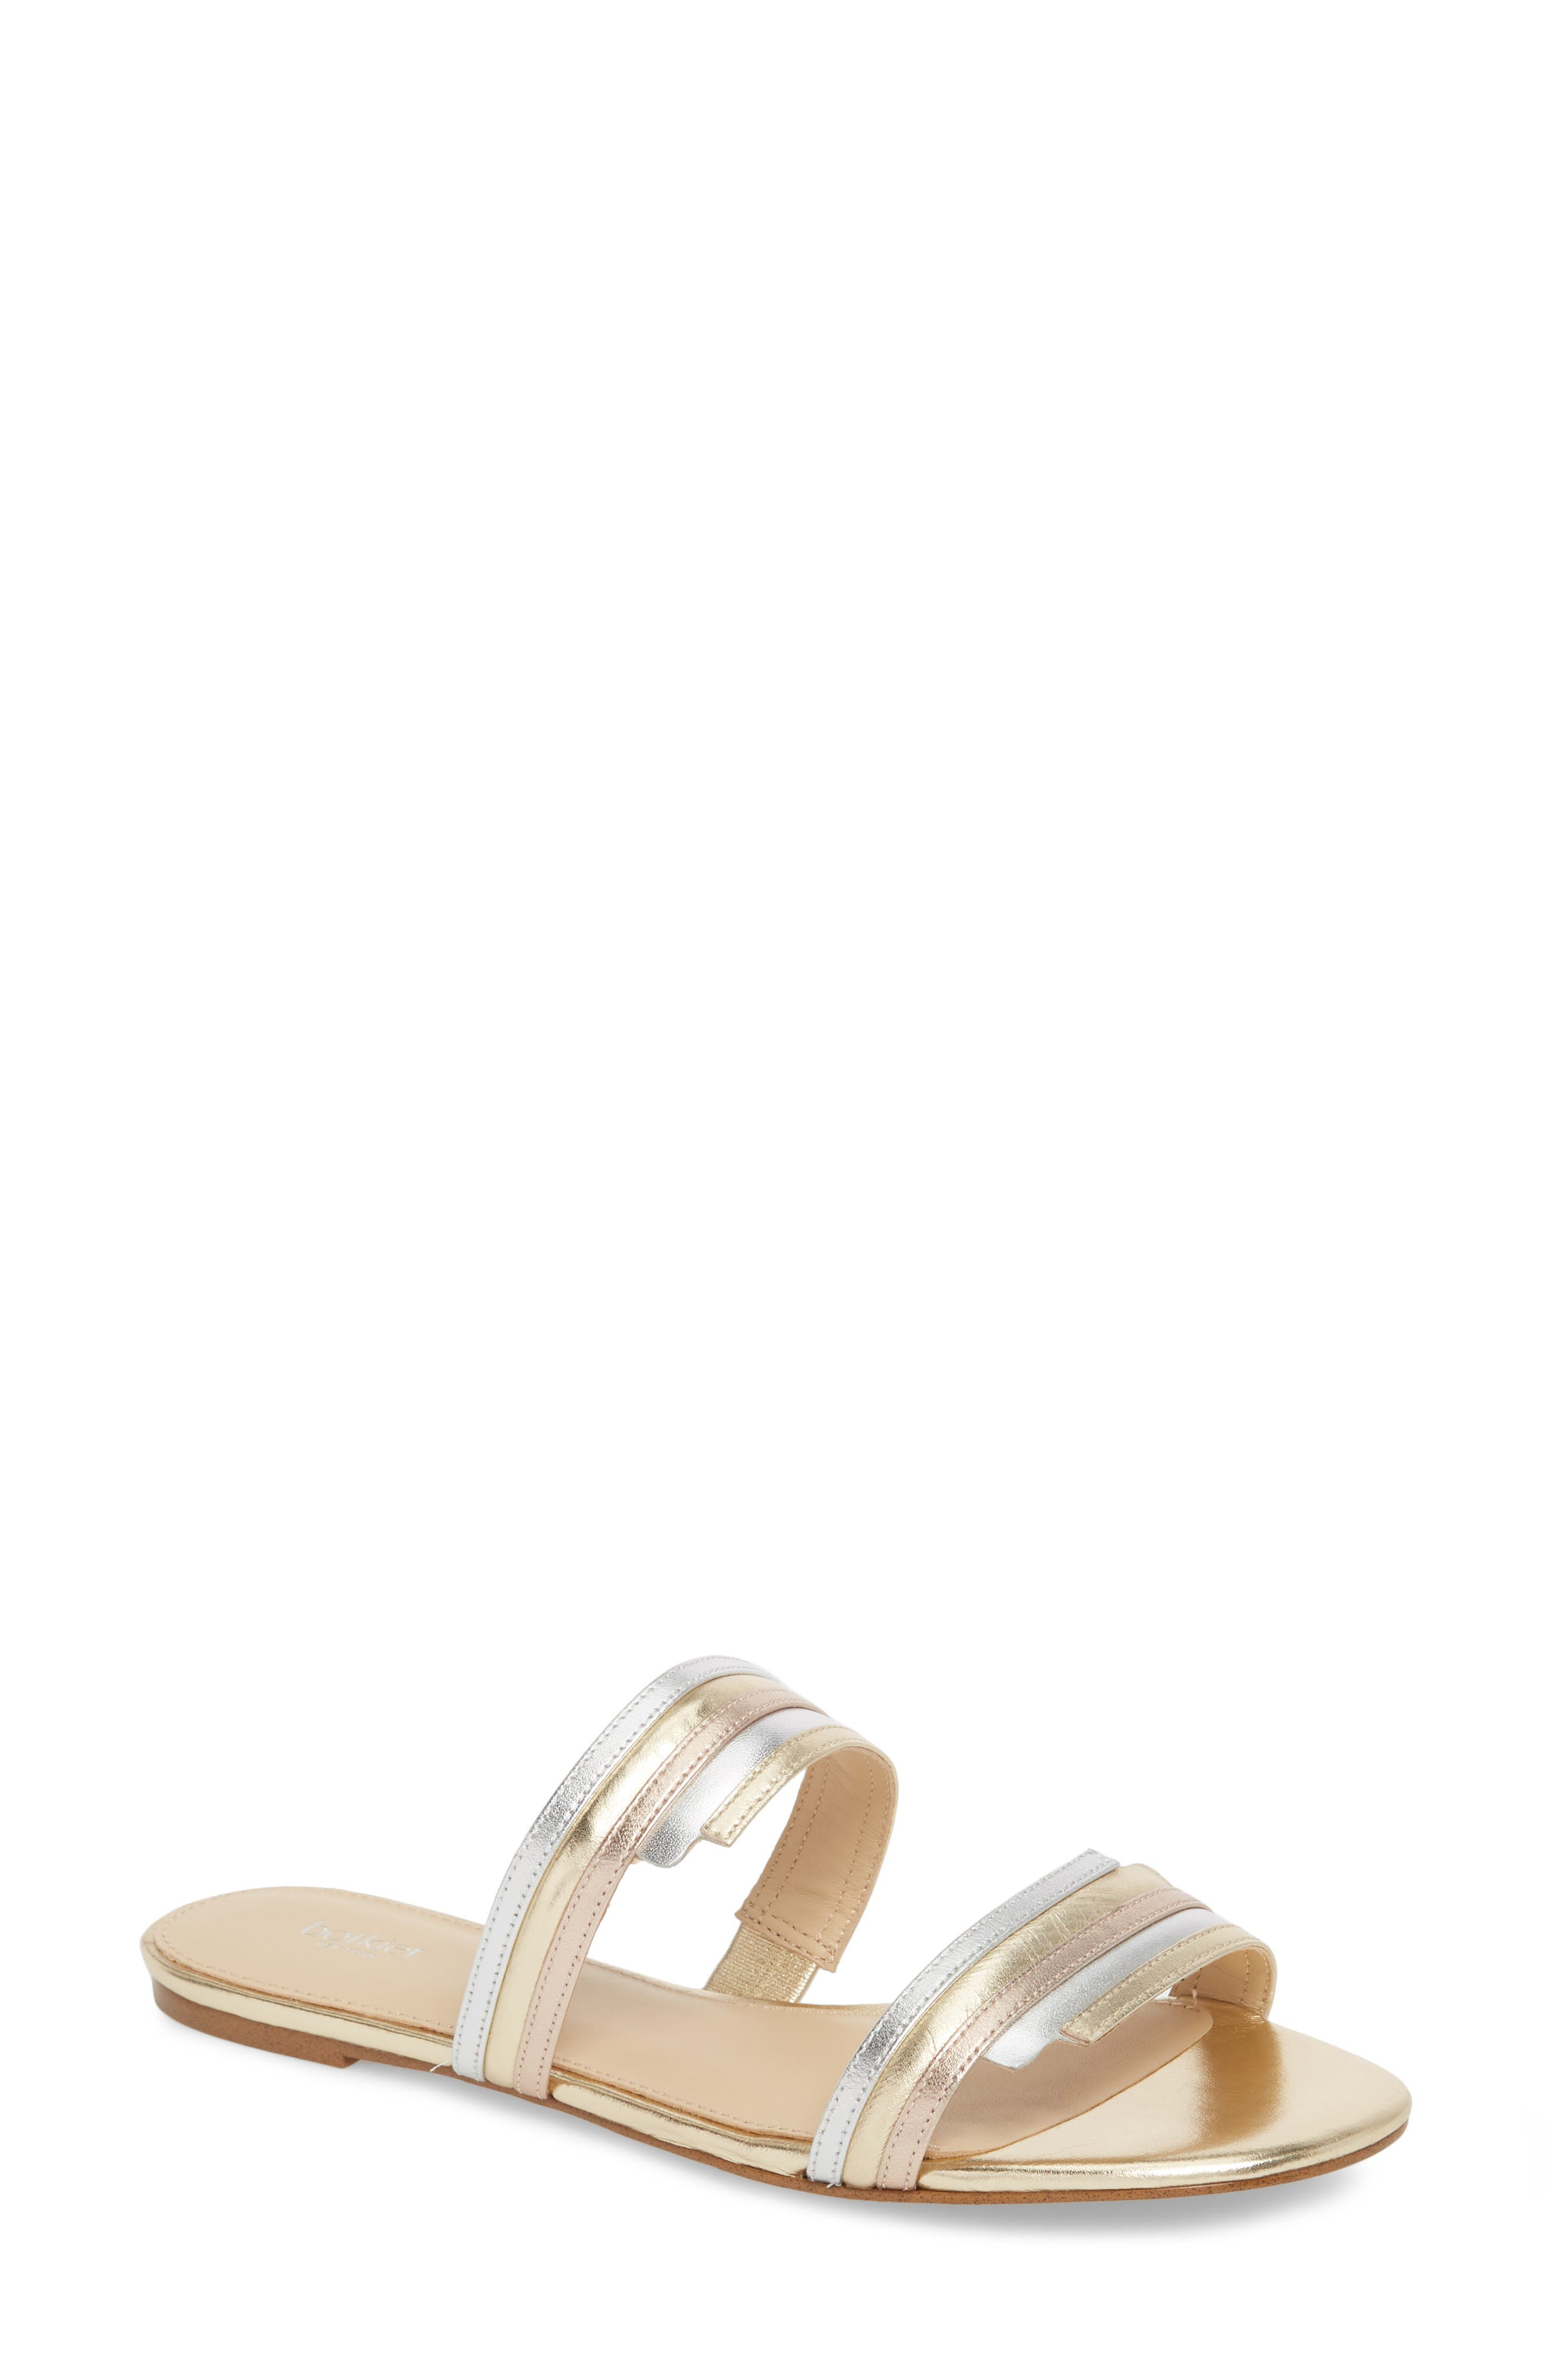 Maise Slide Sandal,                         Main,                         color, Ivory Multi Leather